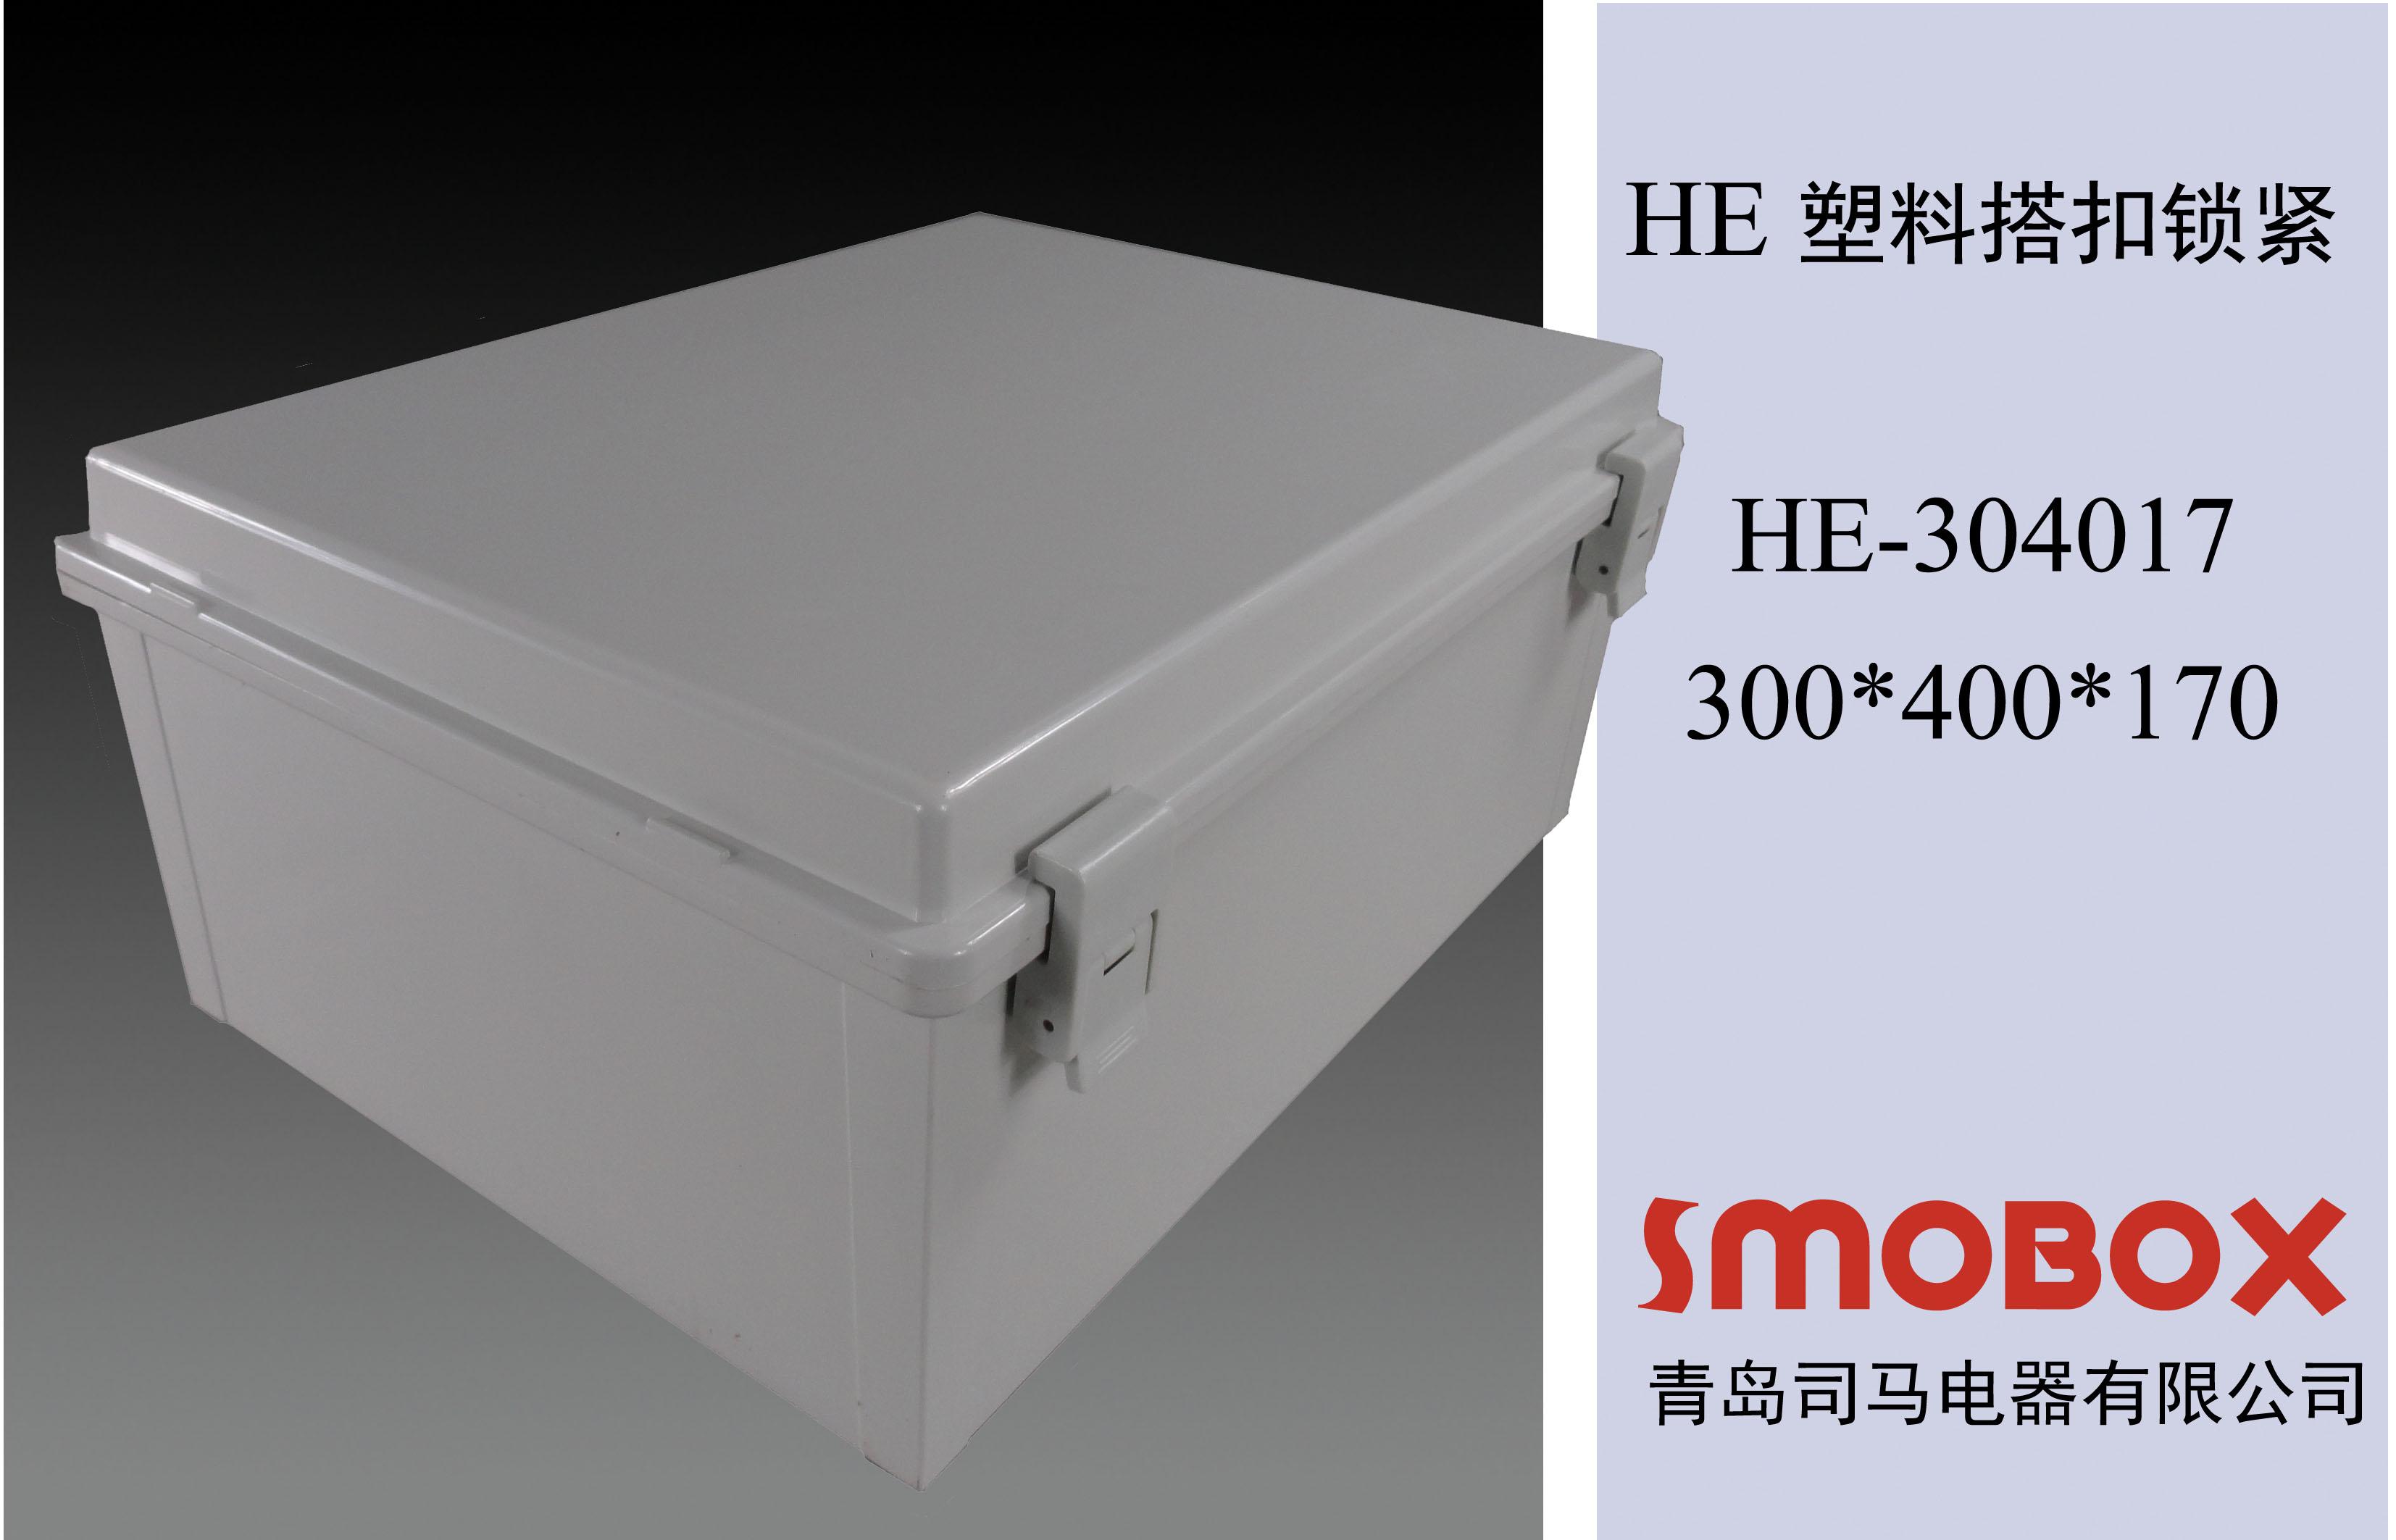 300*400*170T司马电器透明盖防腐电控箱 防水接线箱 耐酸碱控制盒